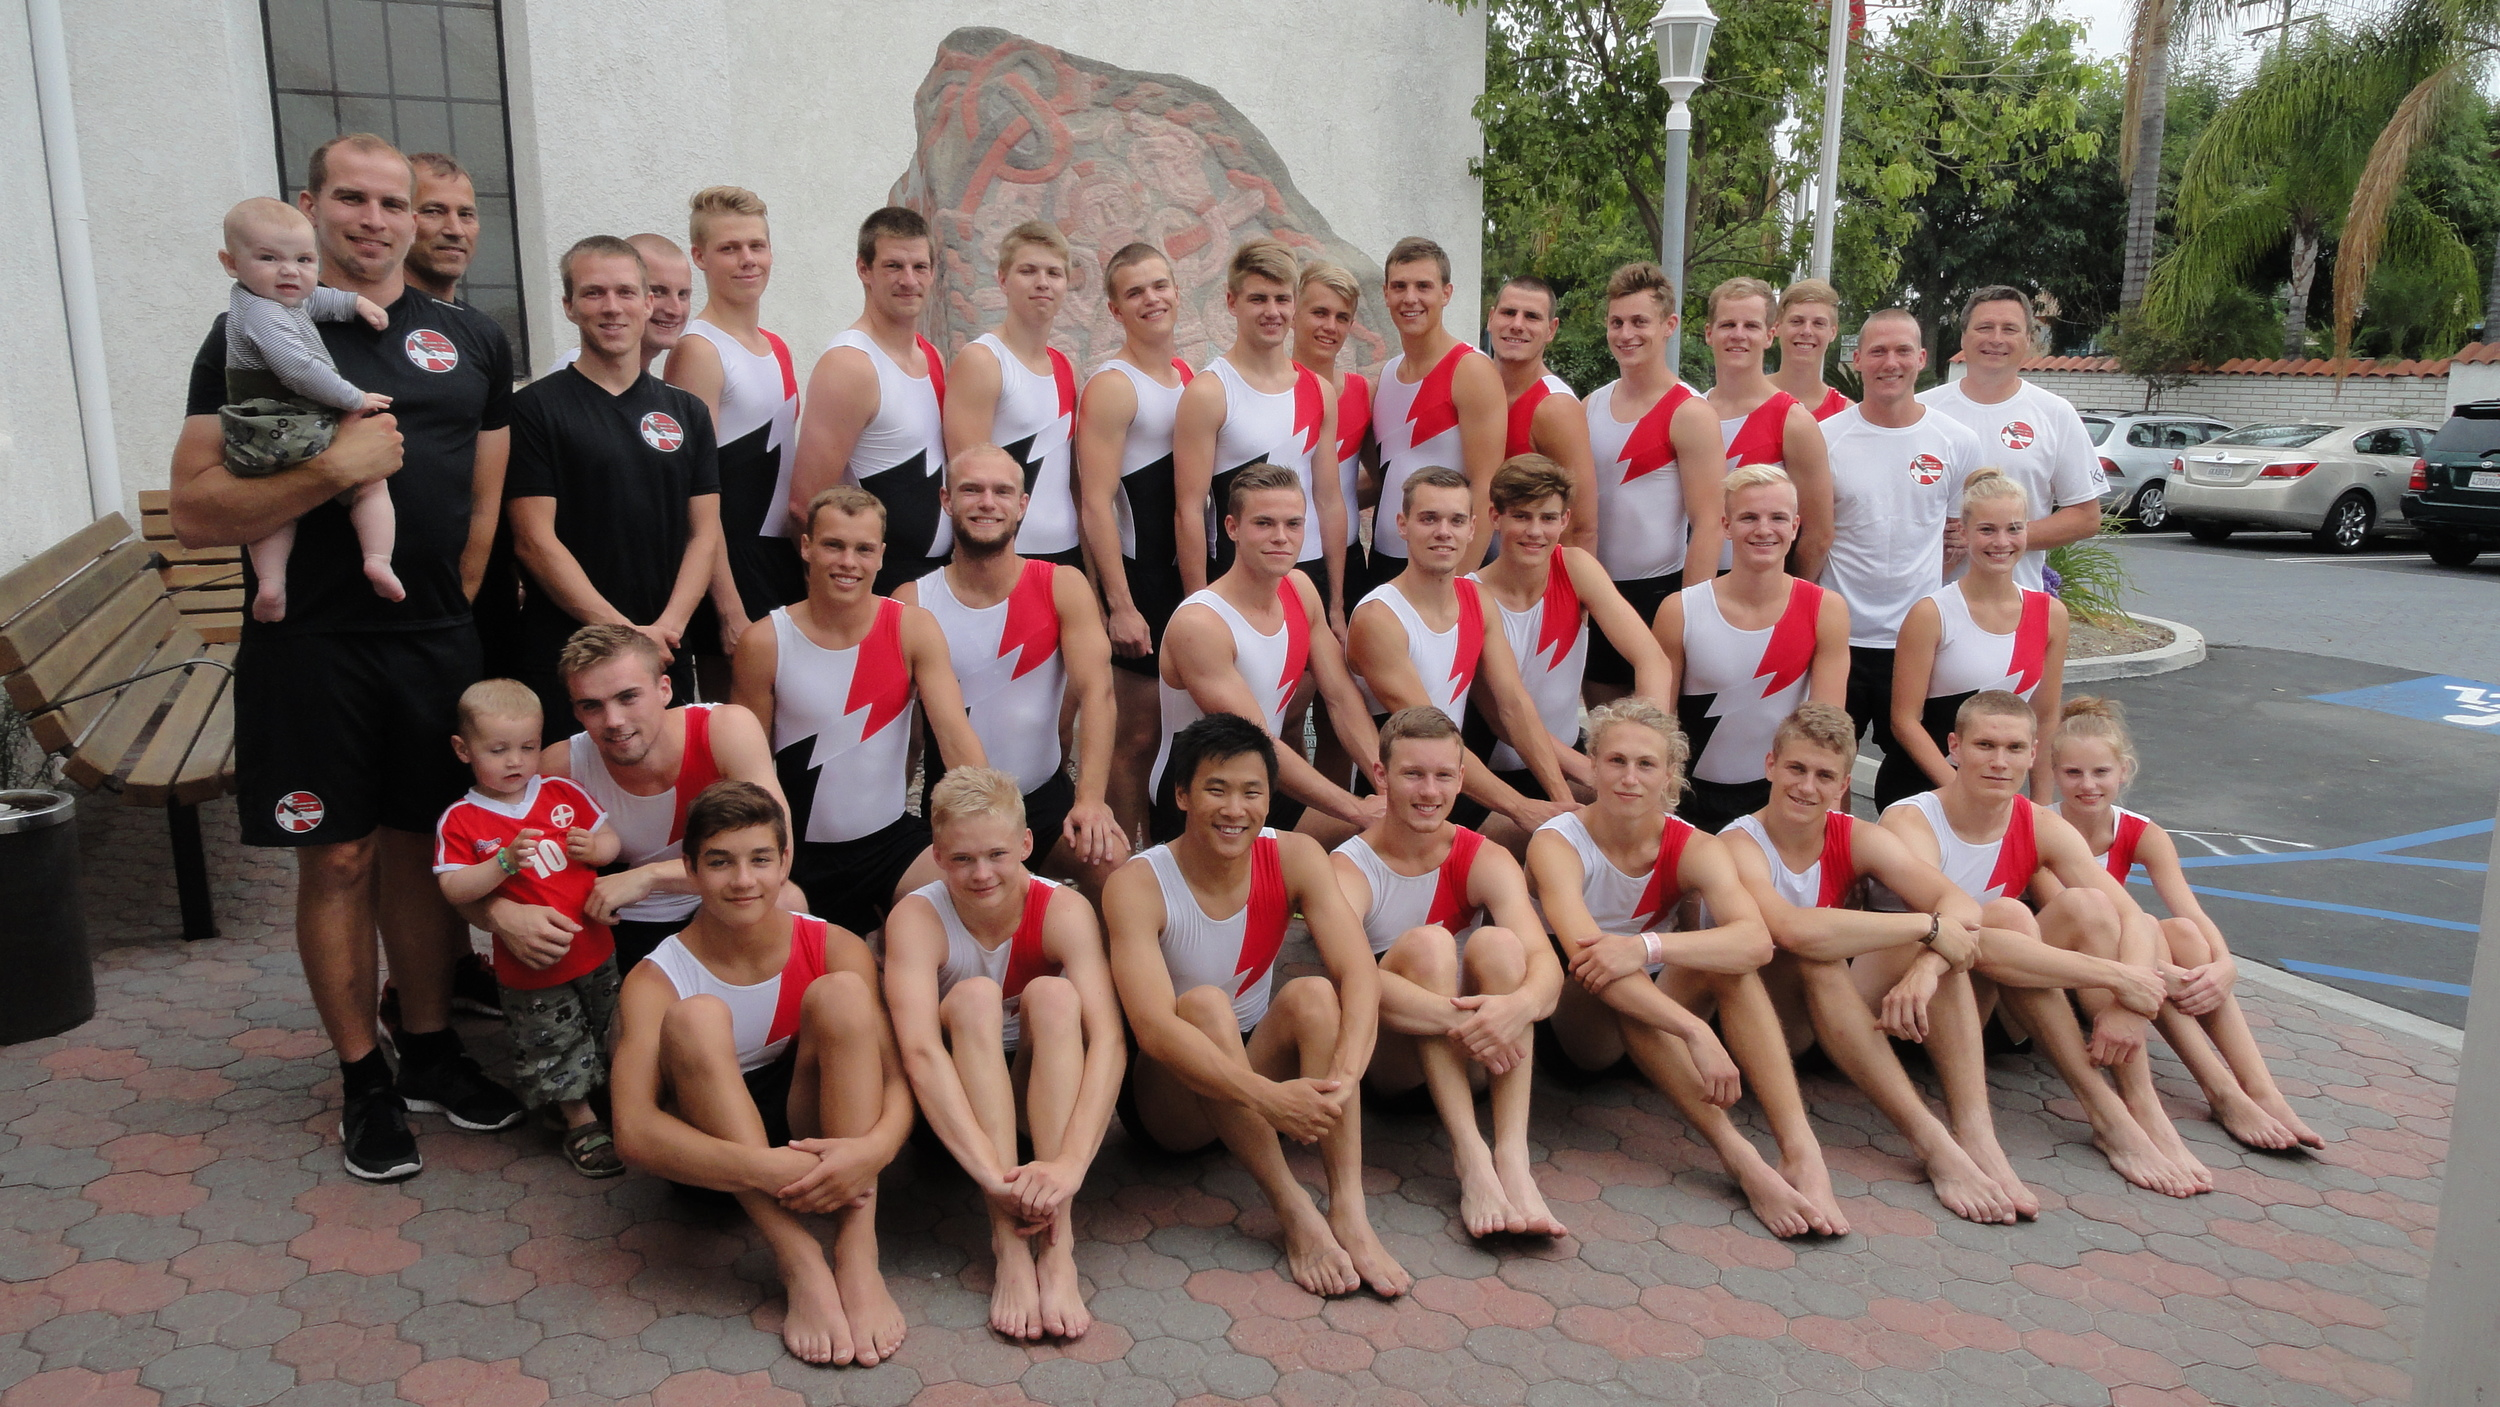 The Ringsted Boys Gymnastics Team